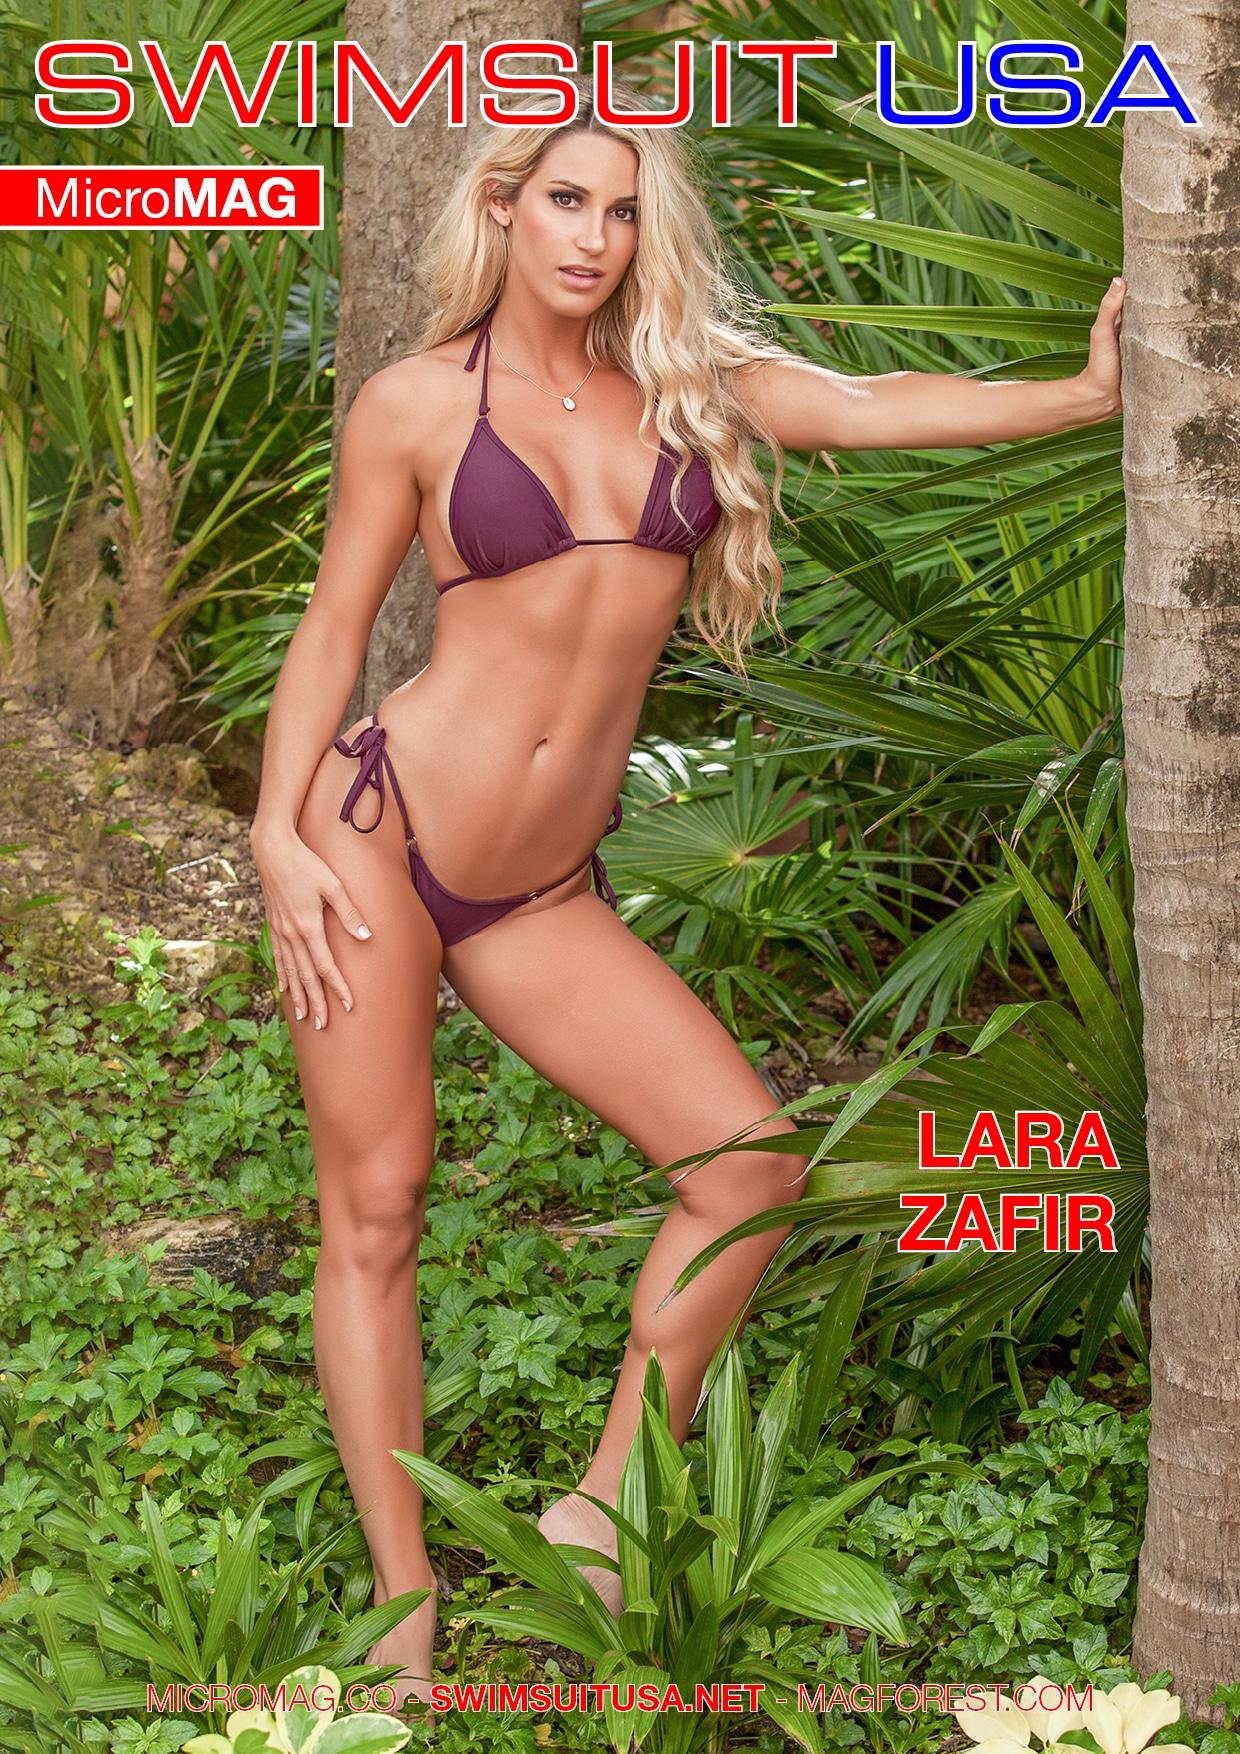 Swimsuit USA MicroMAG - Lara Zafir - Issue 5 2